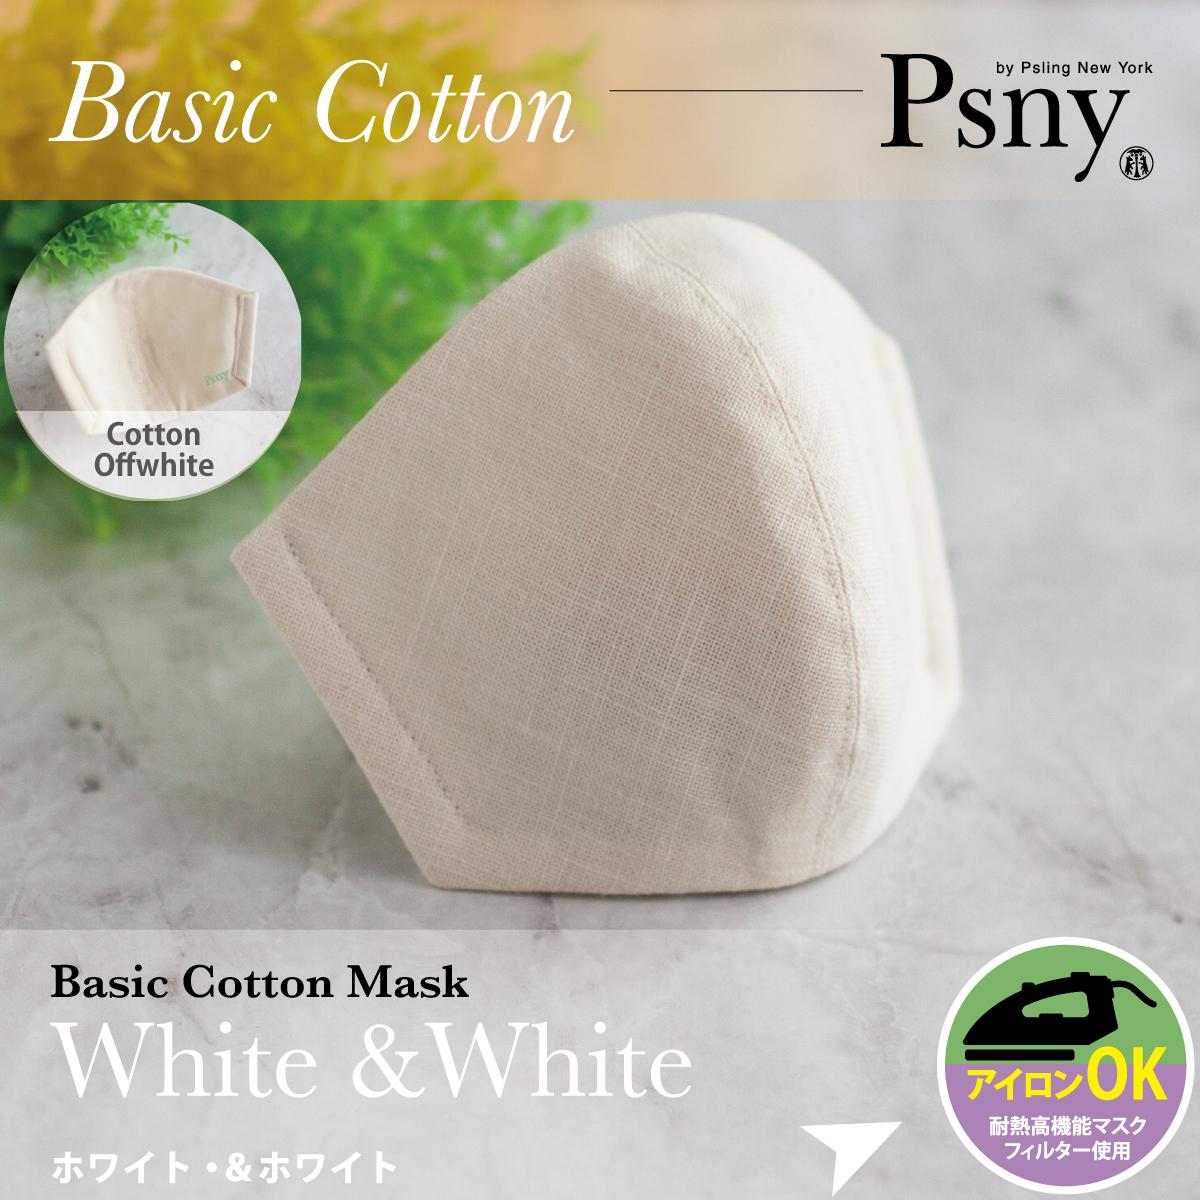 PSNY ベーシックコットン・オフホワイト(&オフホワイト)  花粉 黄砂 洗えるフィルター入り 立体 マスク 大人用 CW12